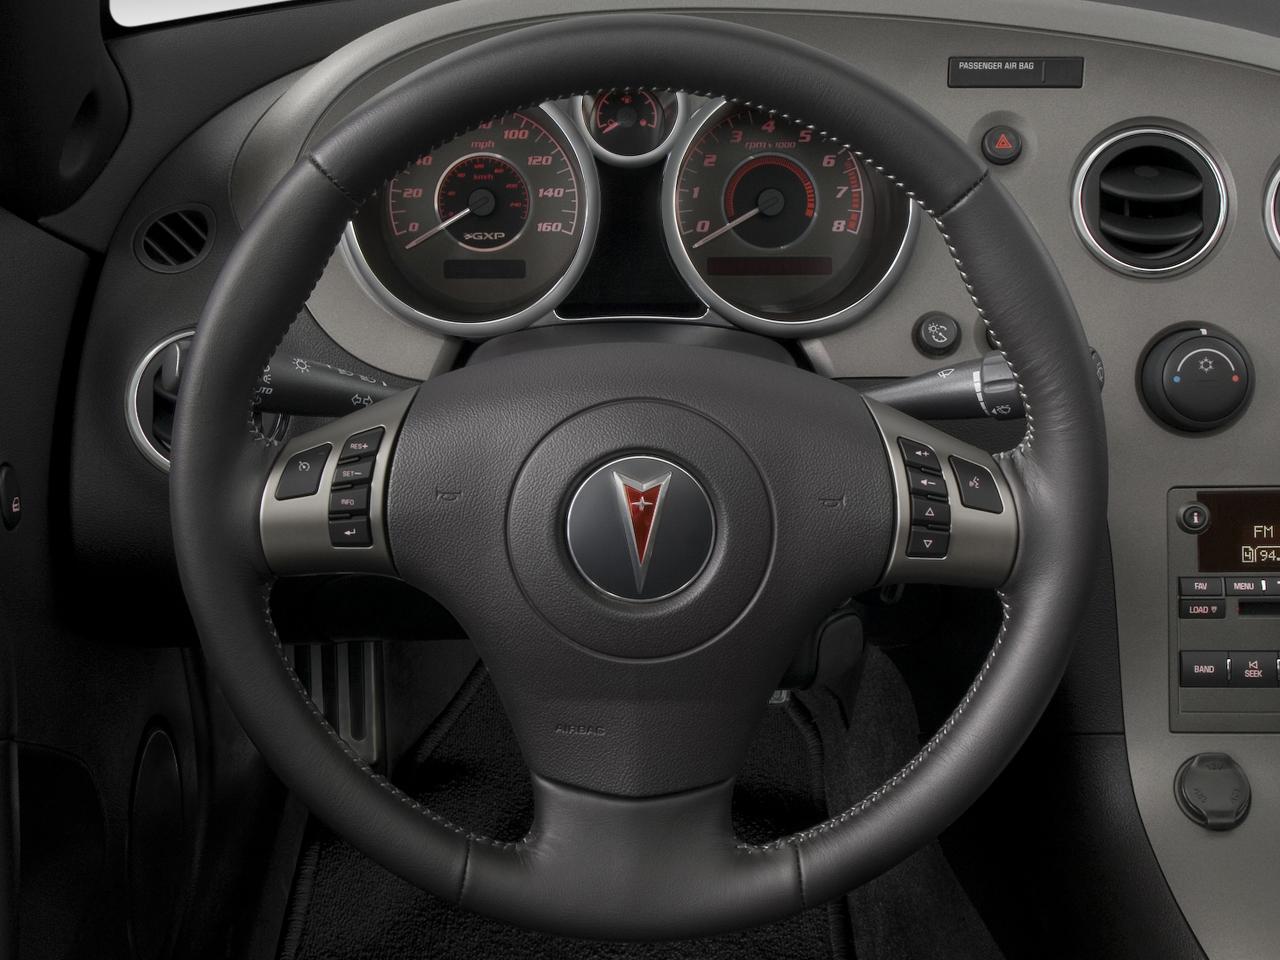 2009 Pontiac Solstice Coupe - Latest News, Reviews, and Auto Show Coverage - Automobile Magazine